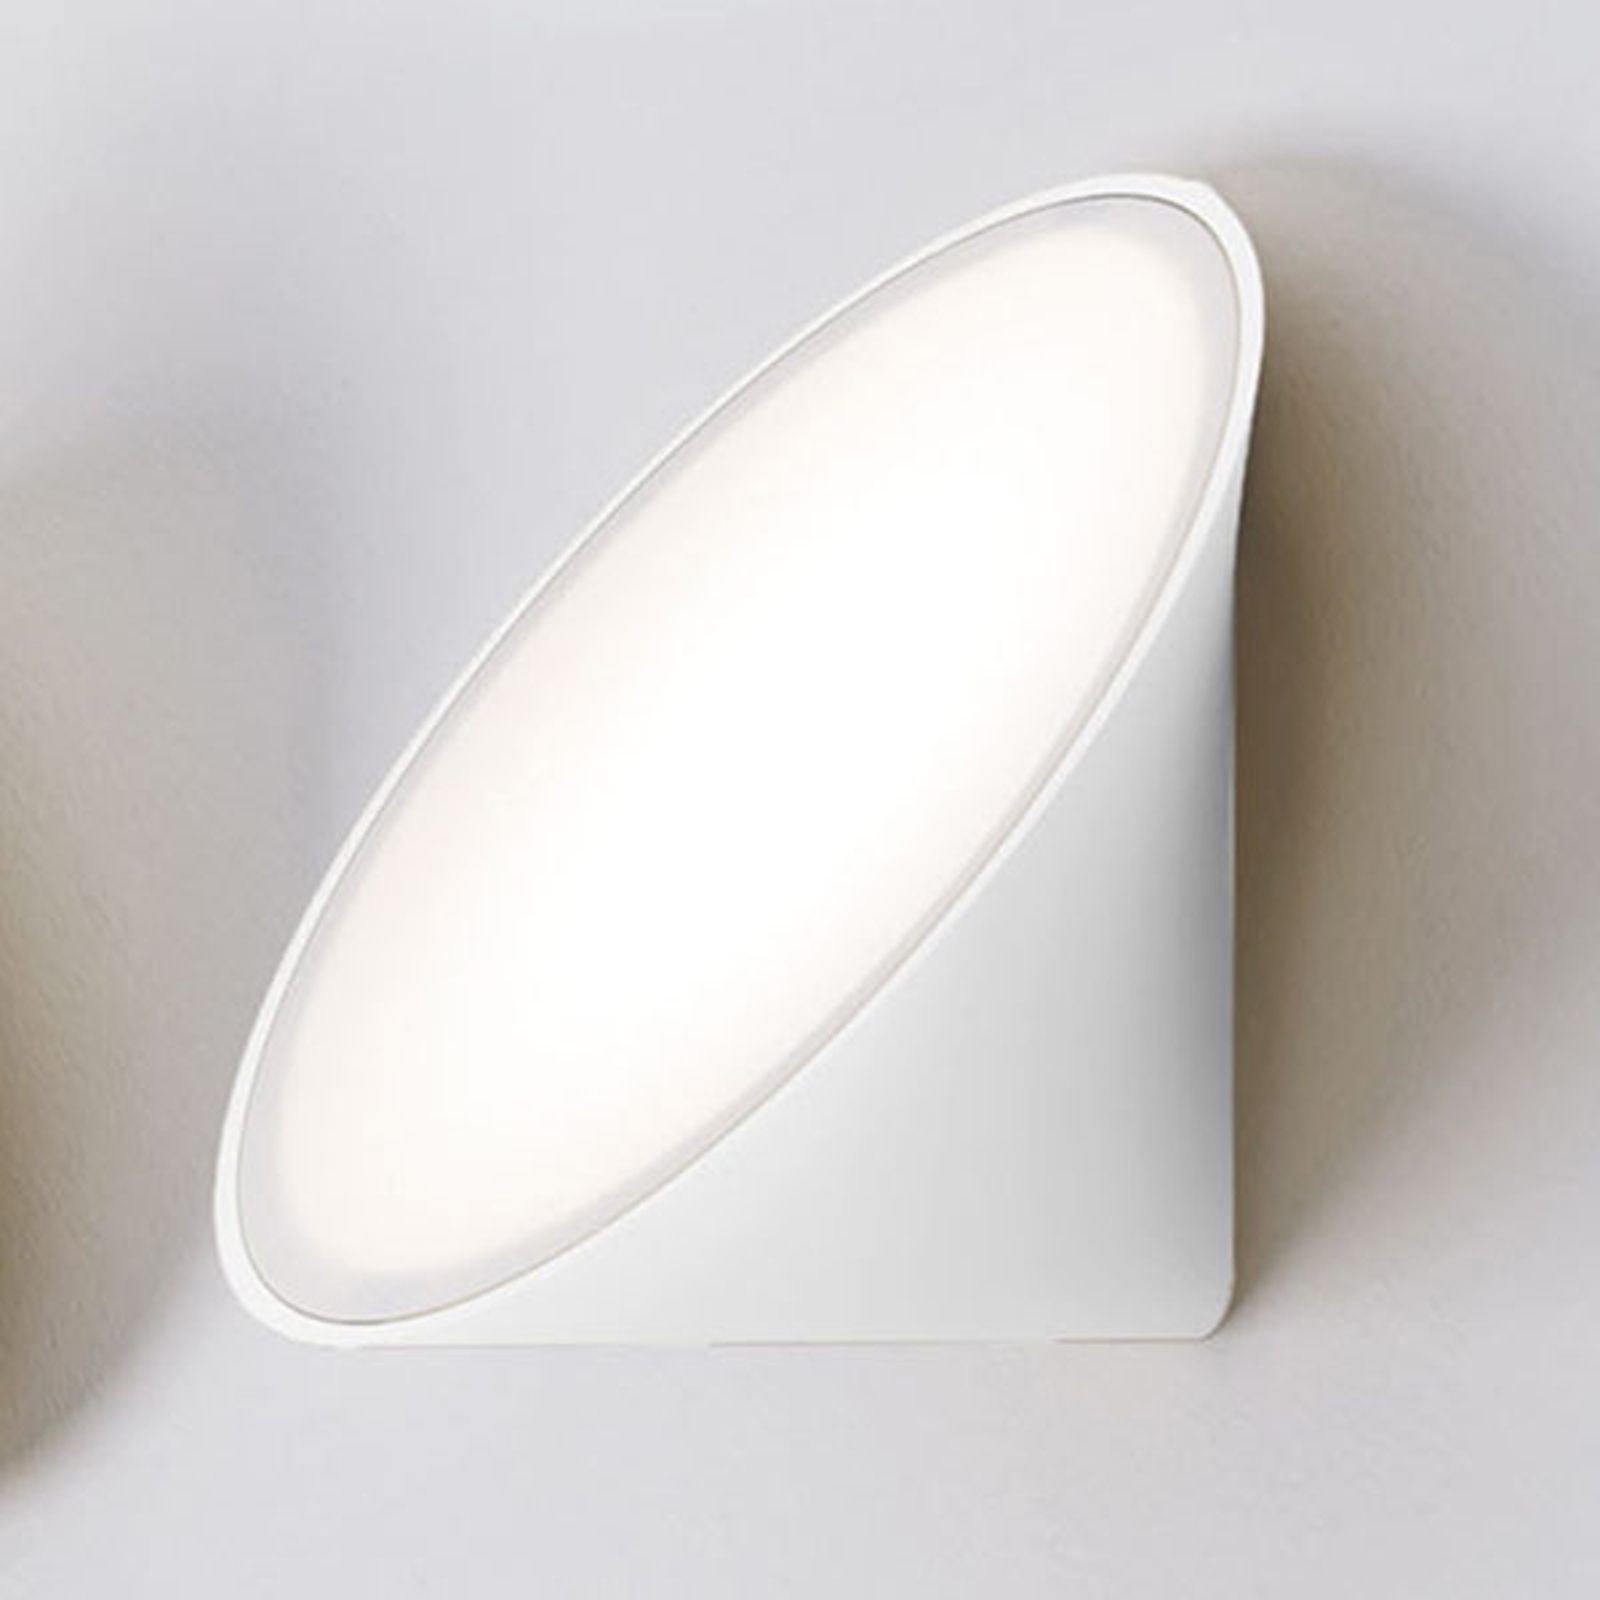 Axolight Orchid LED wandlamp, wit